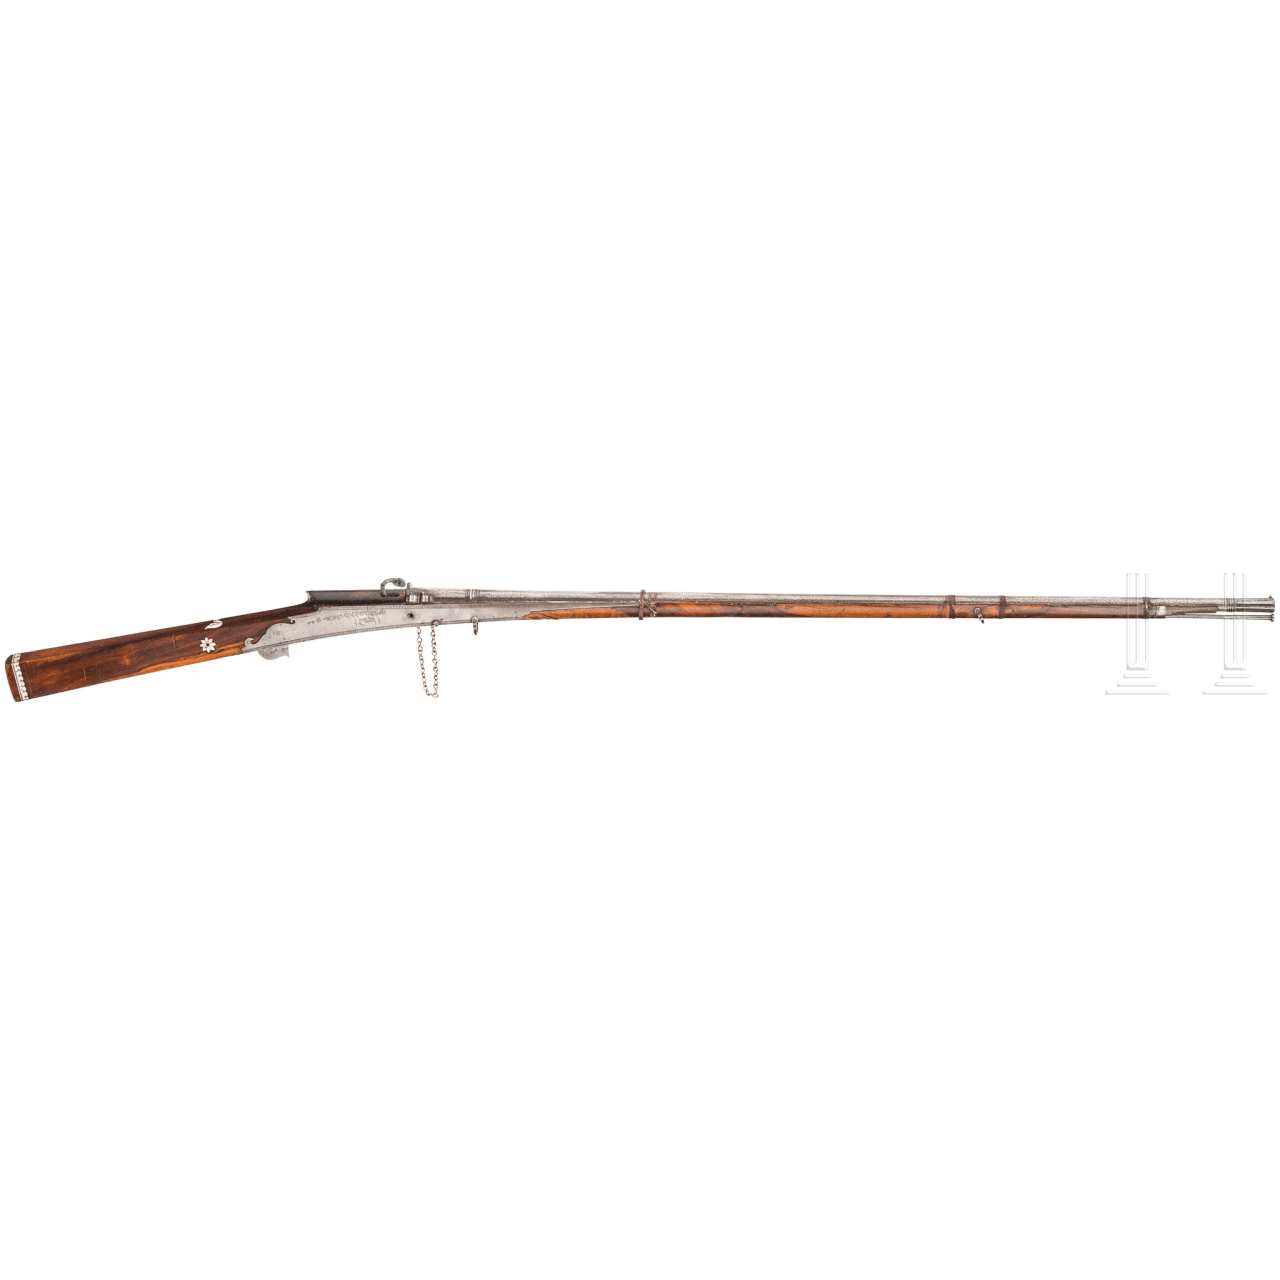 An Indian silver inlaid matchlock gun, ca. 1800